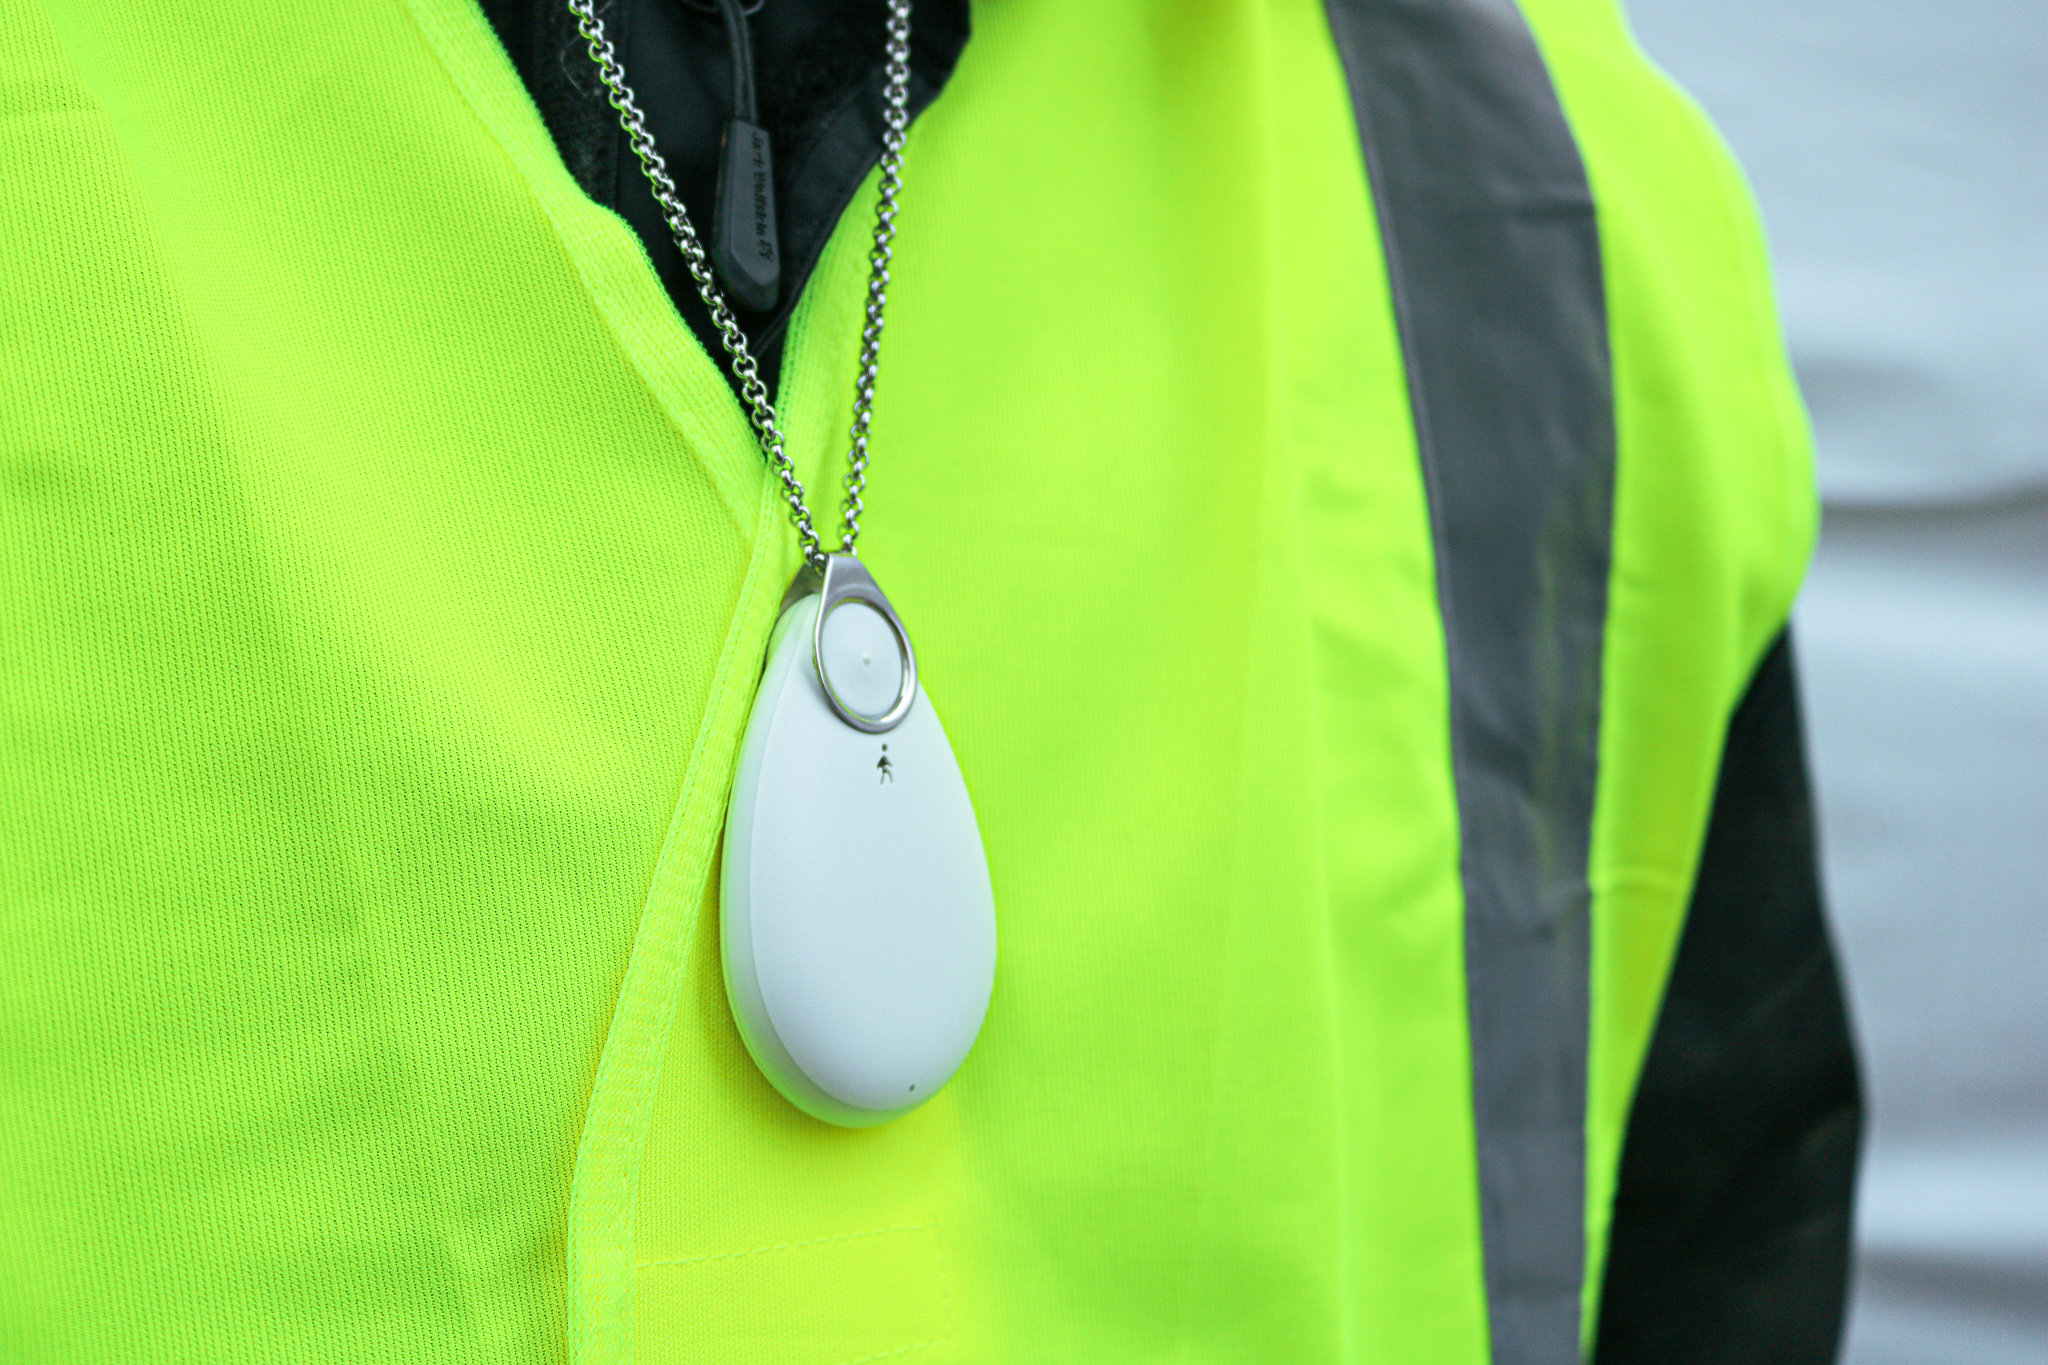 lone worker in hi-vis jacket wearing a Lone Alarm around their neck